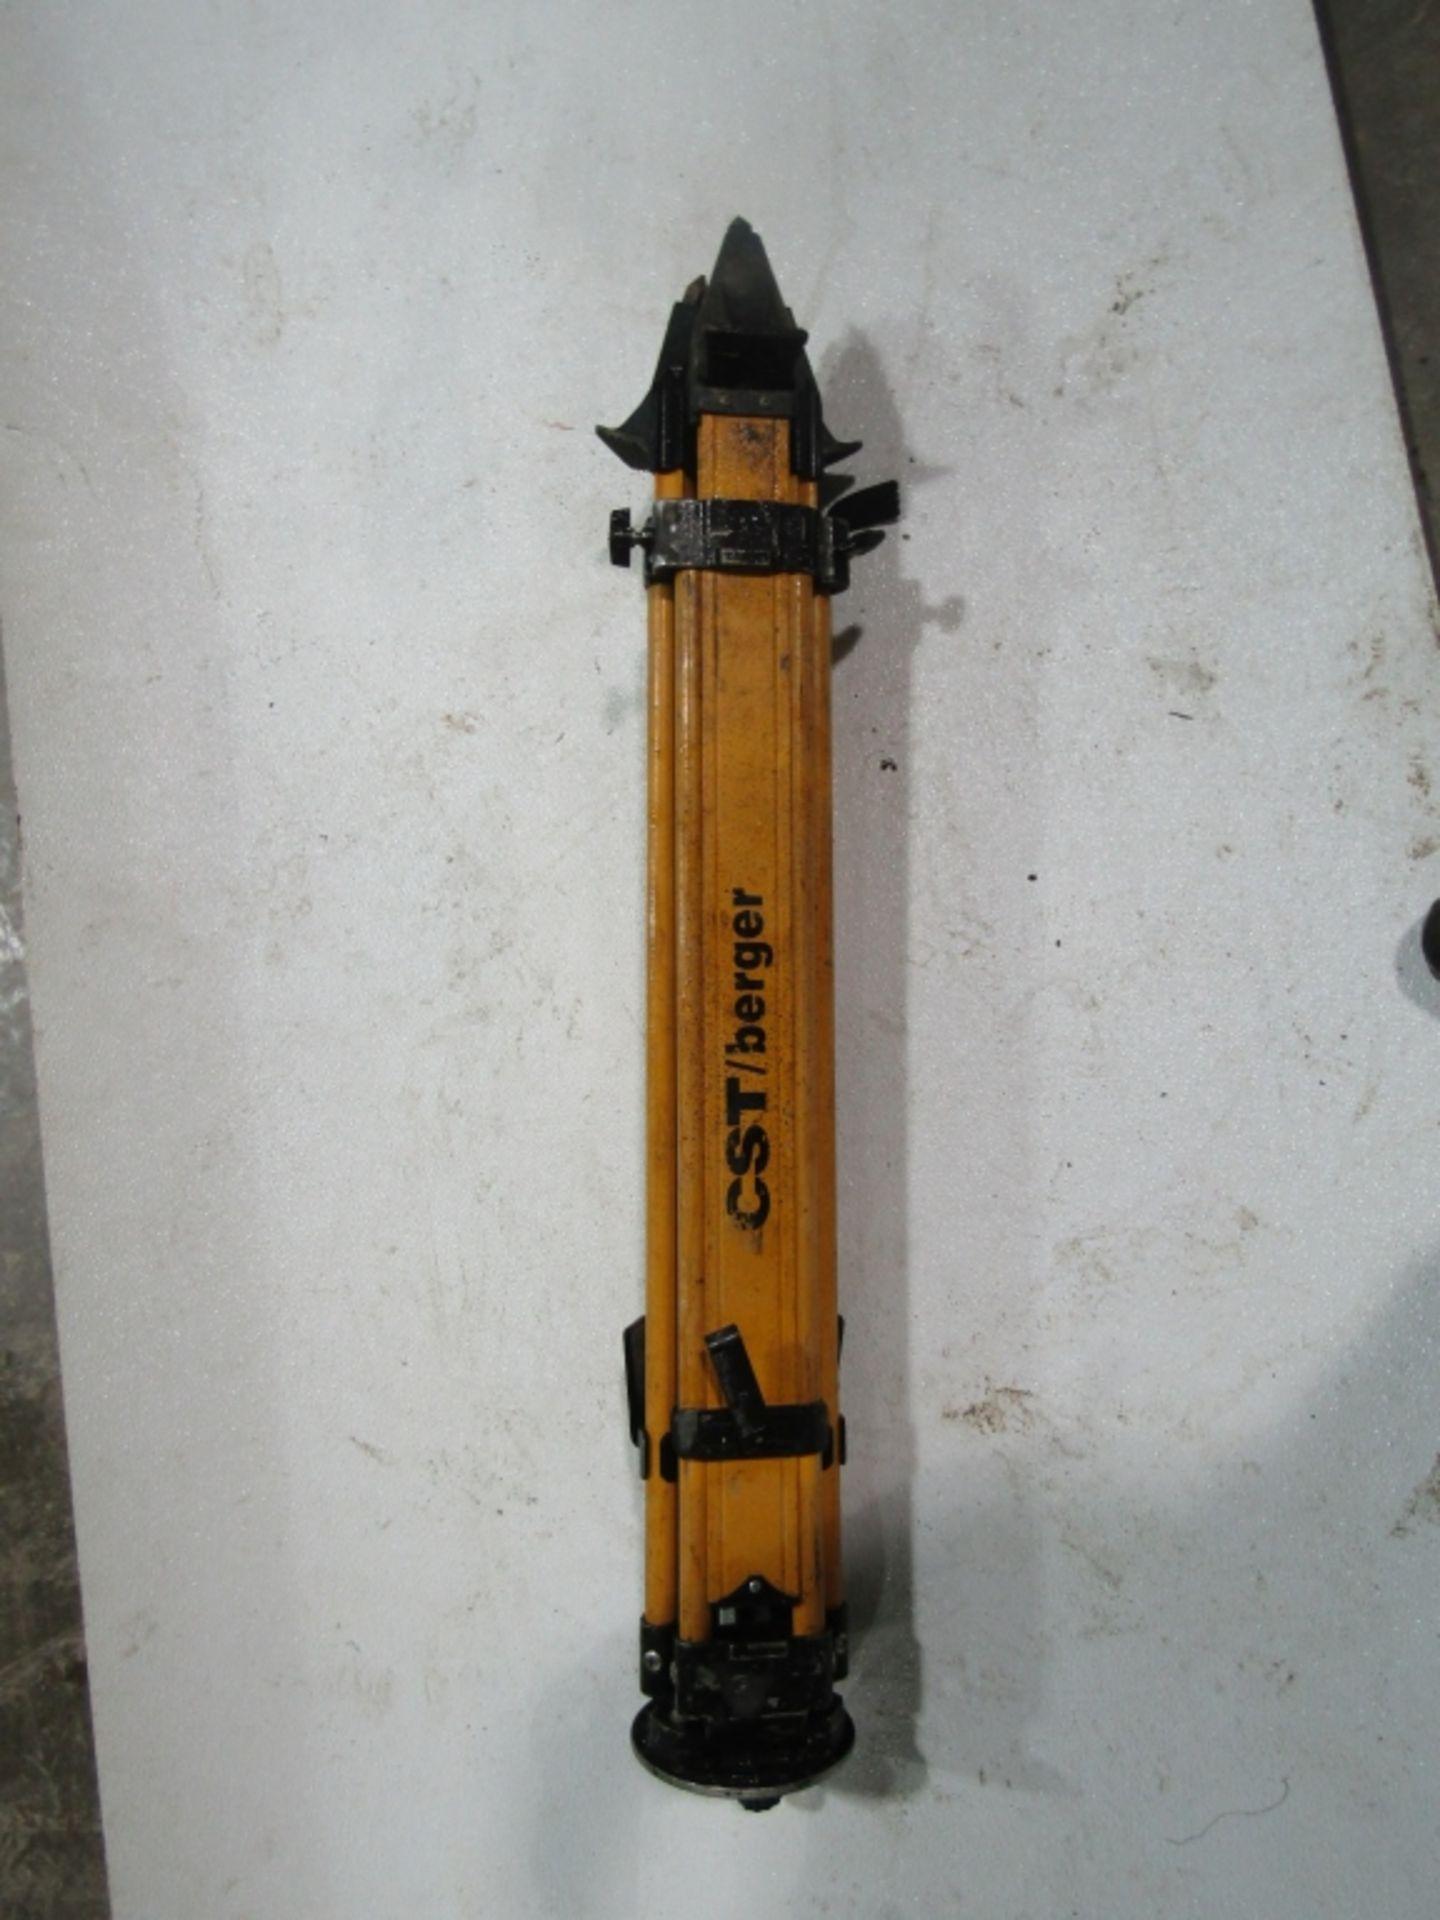 Lot 280 - CST/berger WDF20 Performance Laser Tripod Max, Model WDF20, Located in Winterset, IA